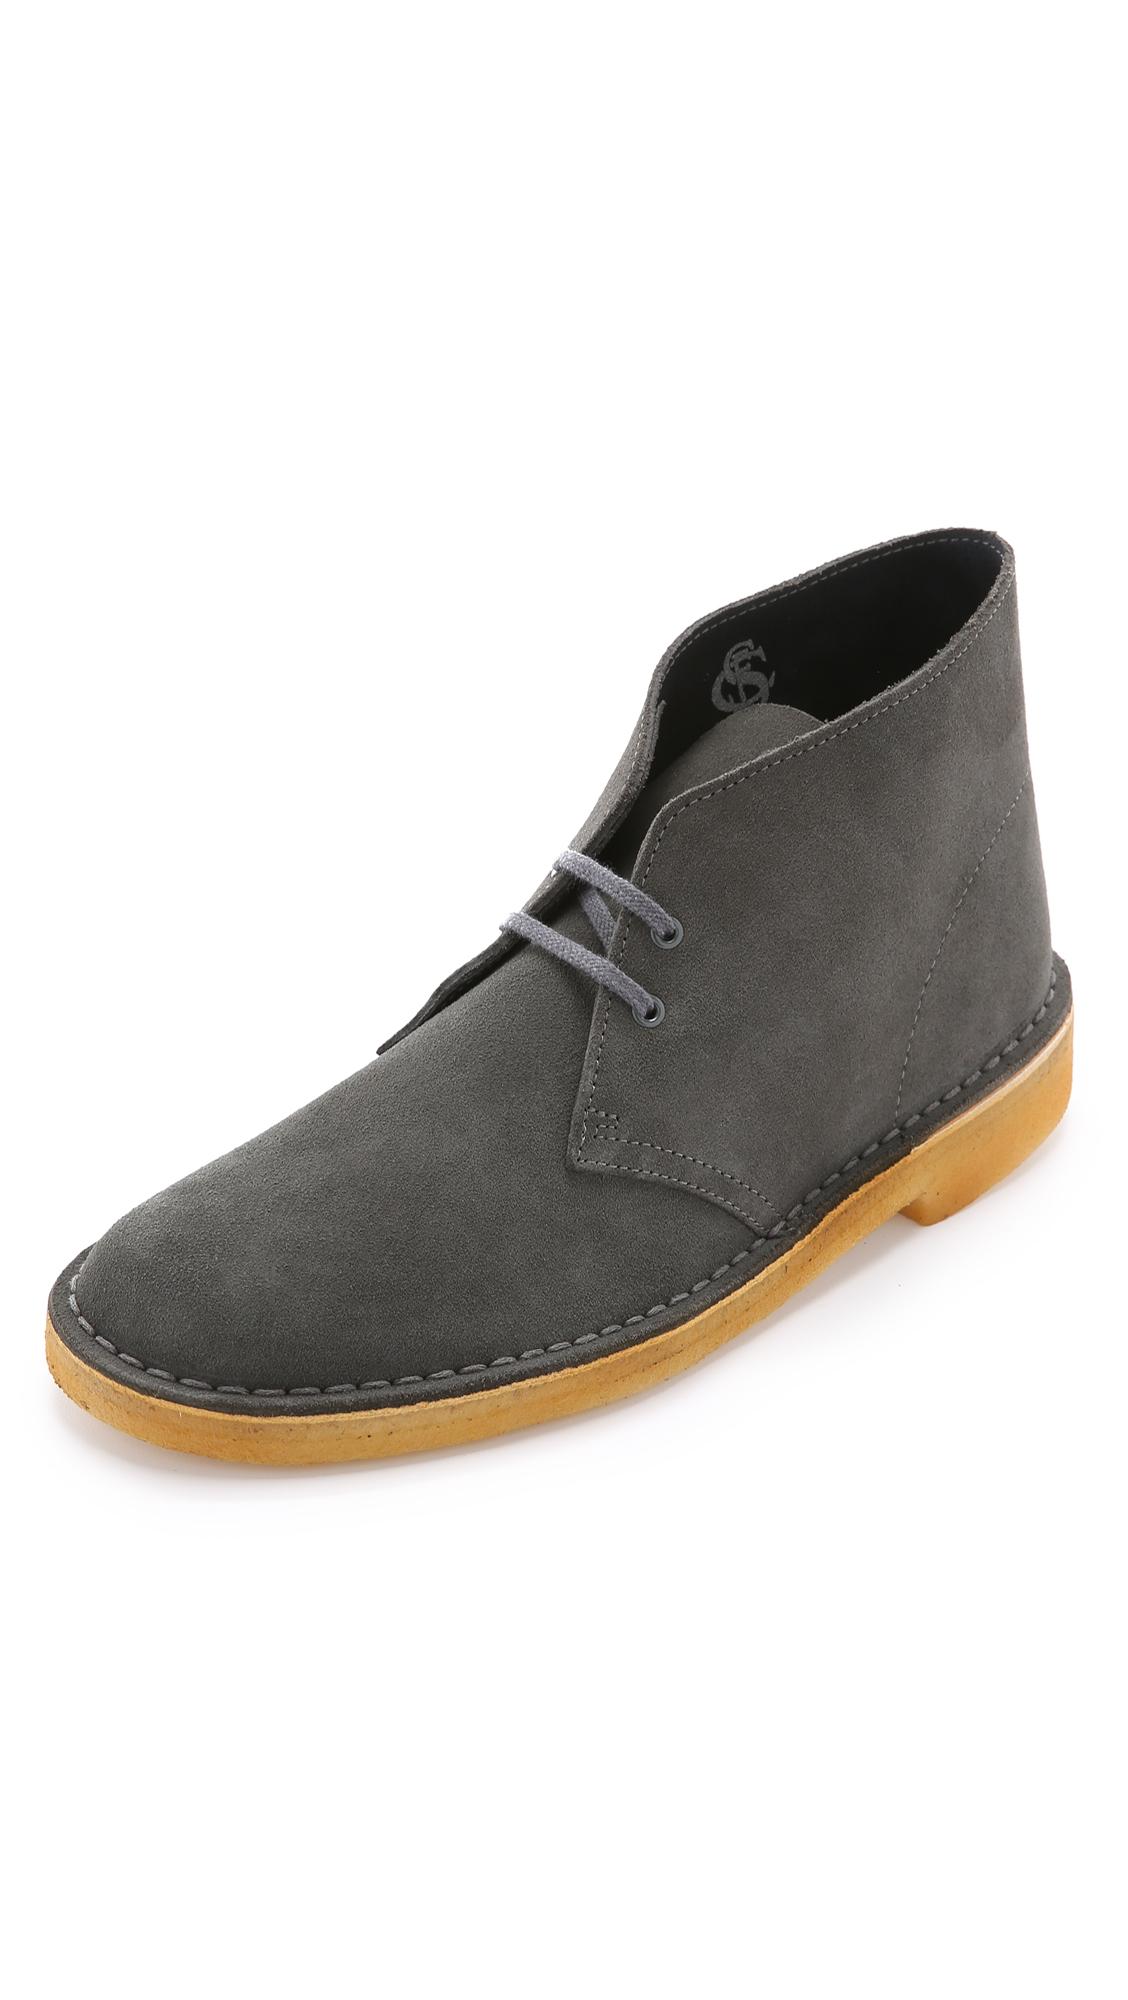 Clarks Suede Desert Boots In Gray For Men Lyst